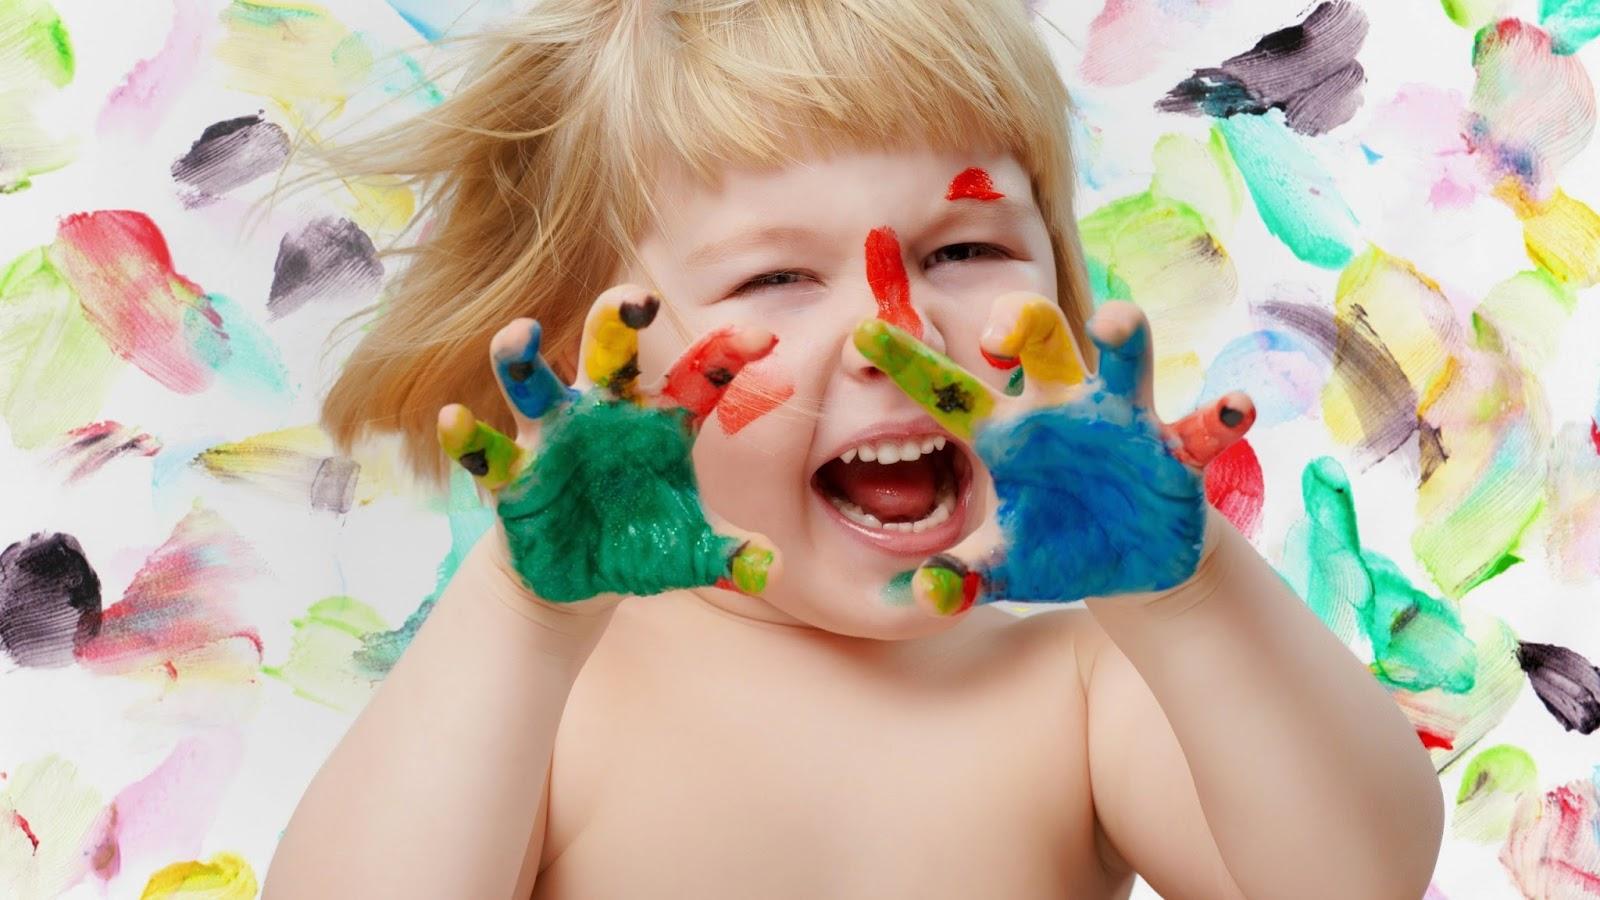 Windows 8 HD Wallpapers: cute Kids Wallpapers Episode 3